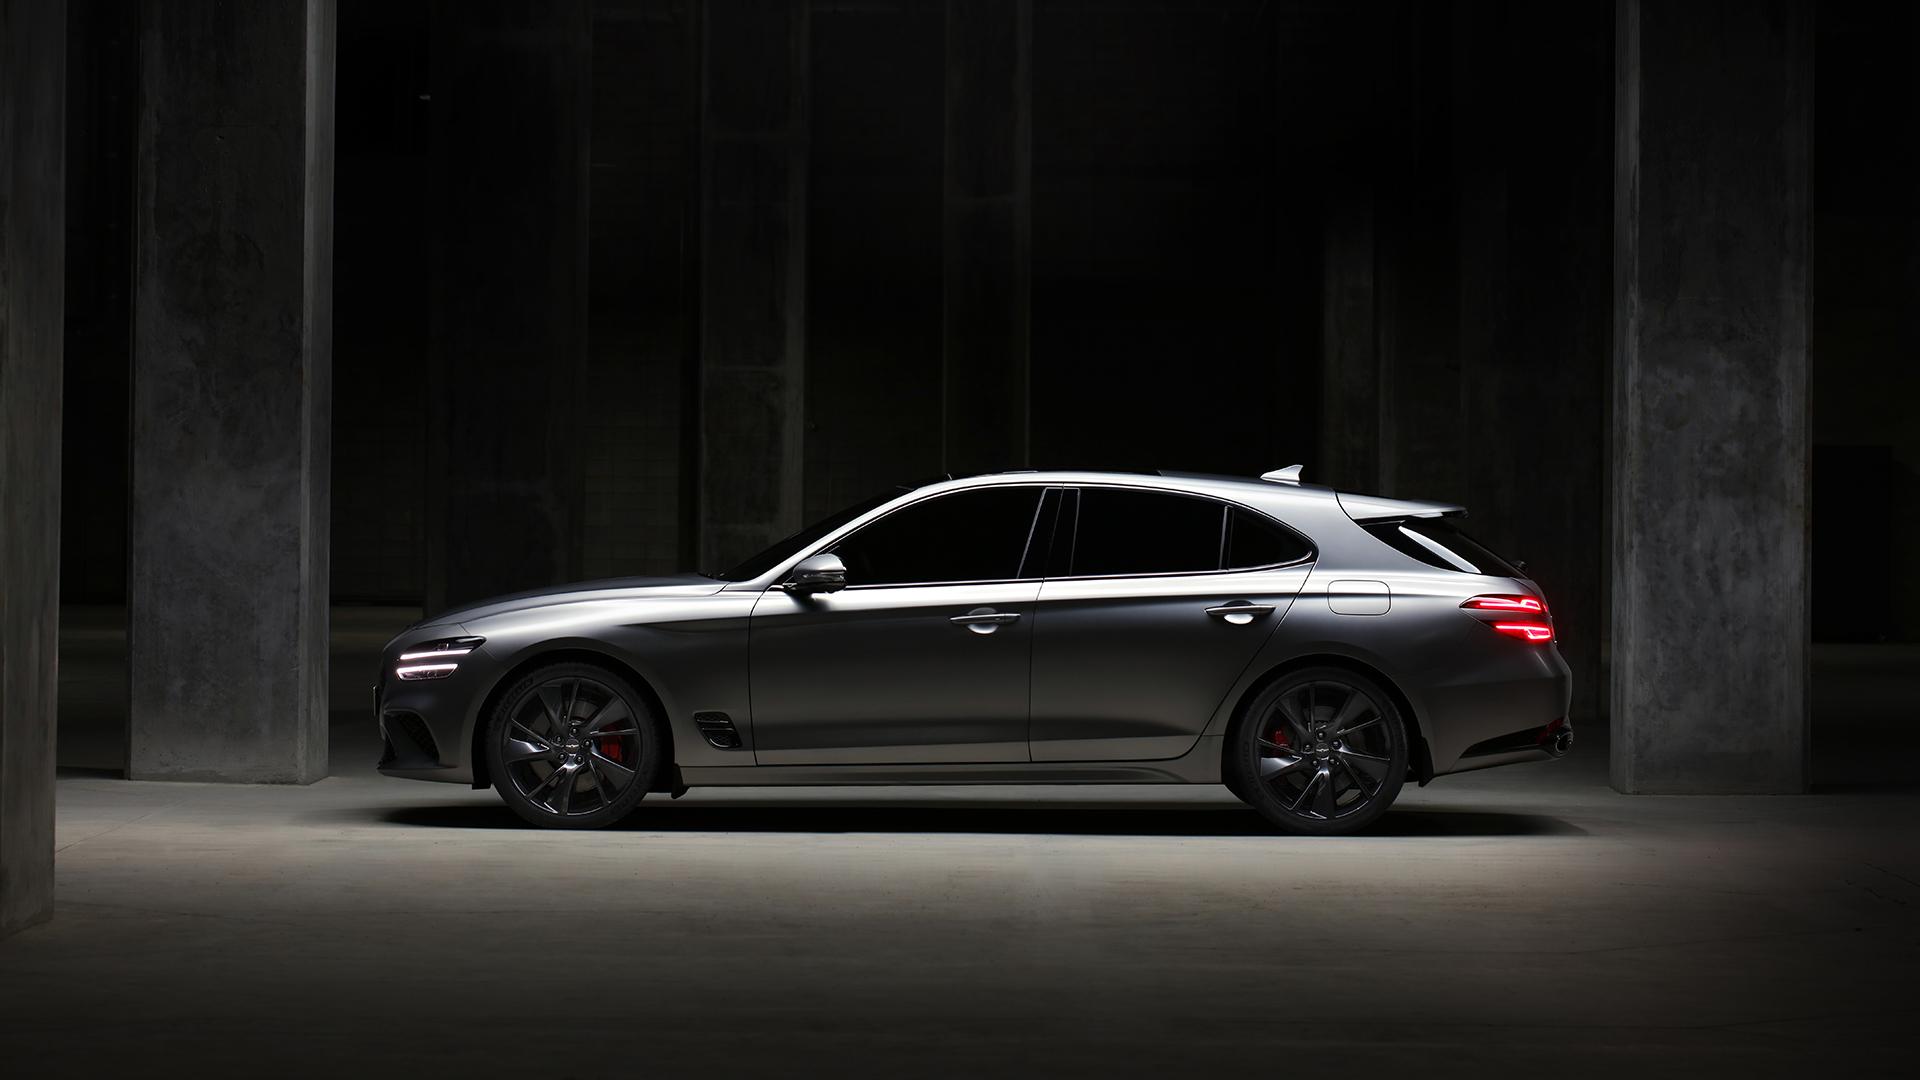 2022 Genesis G70, 2022 Mercedes-Benz EQS, 2022 Chevrolet Corvette Z06: This Week's Top Photos